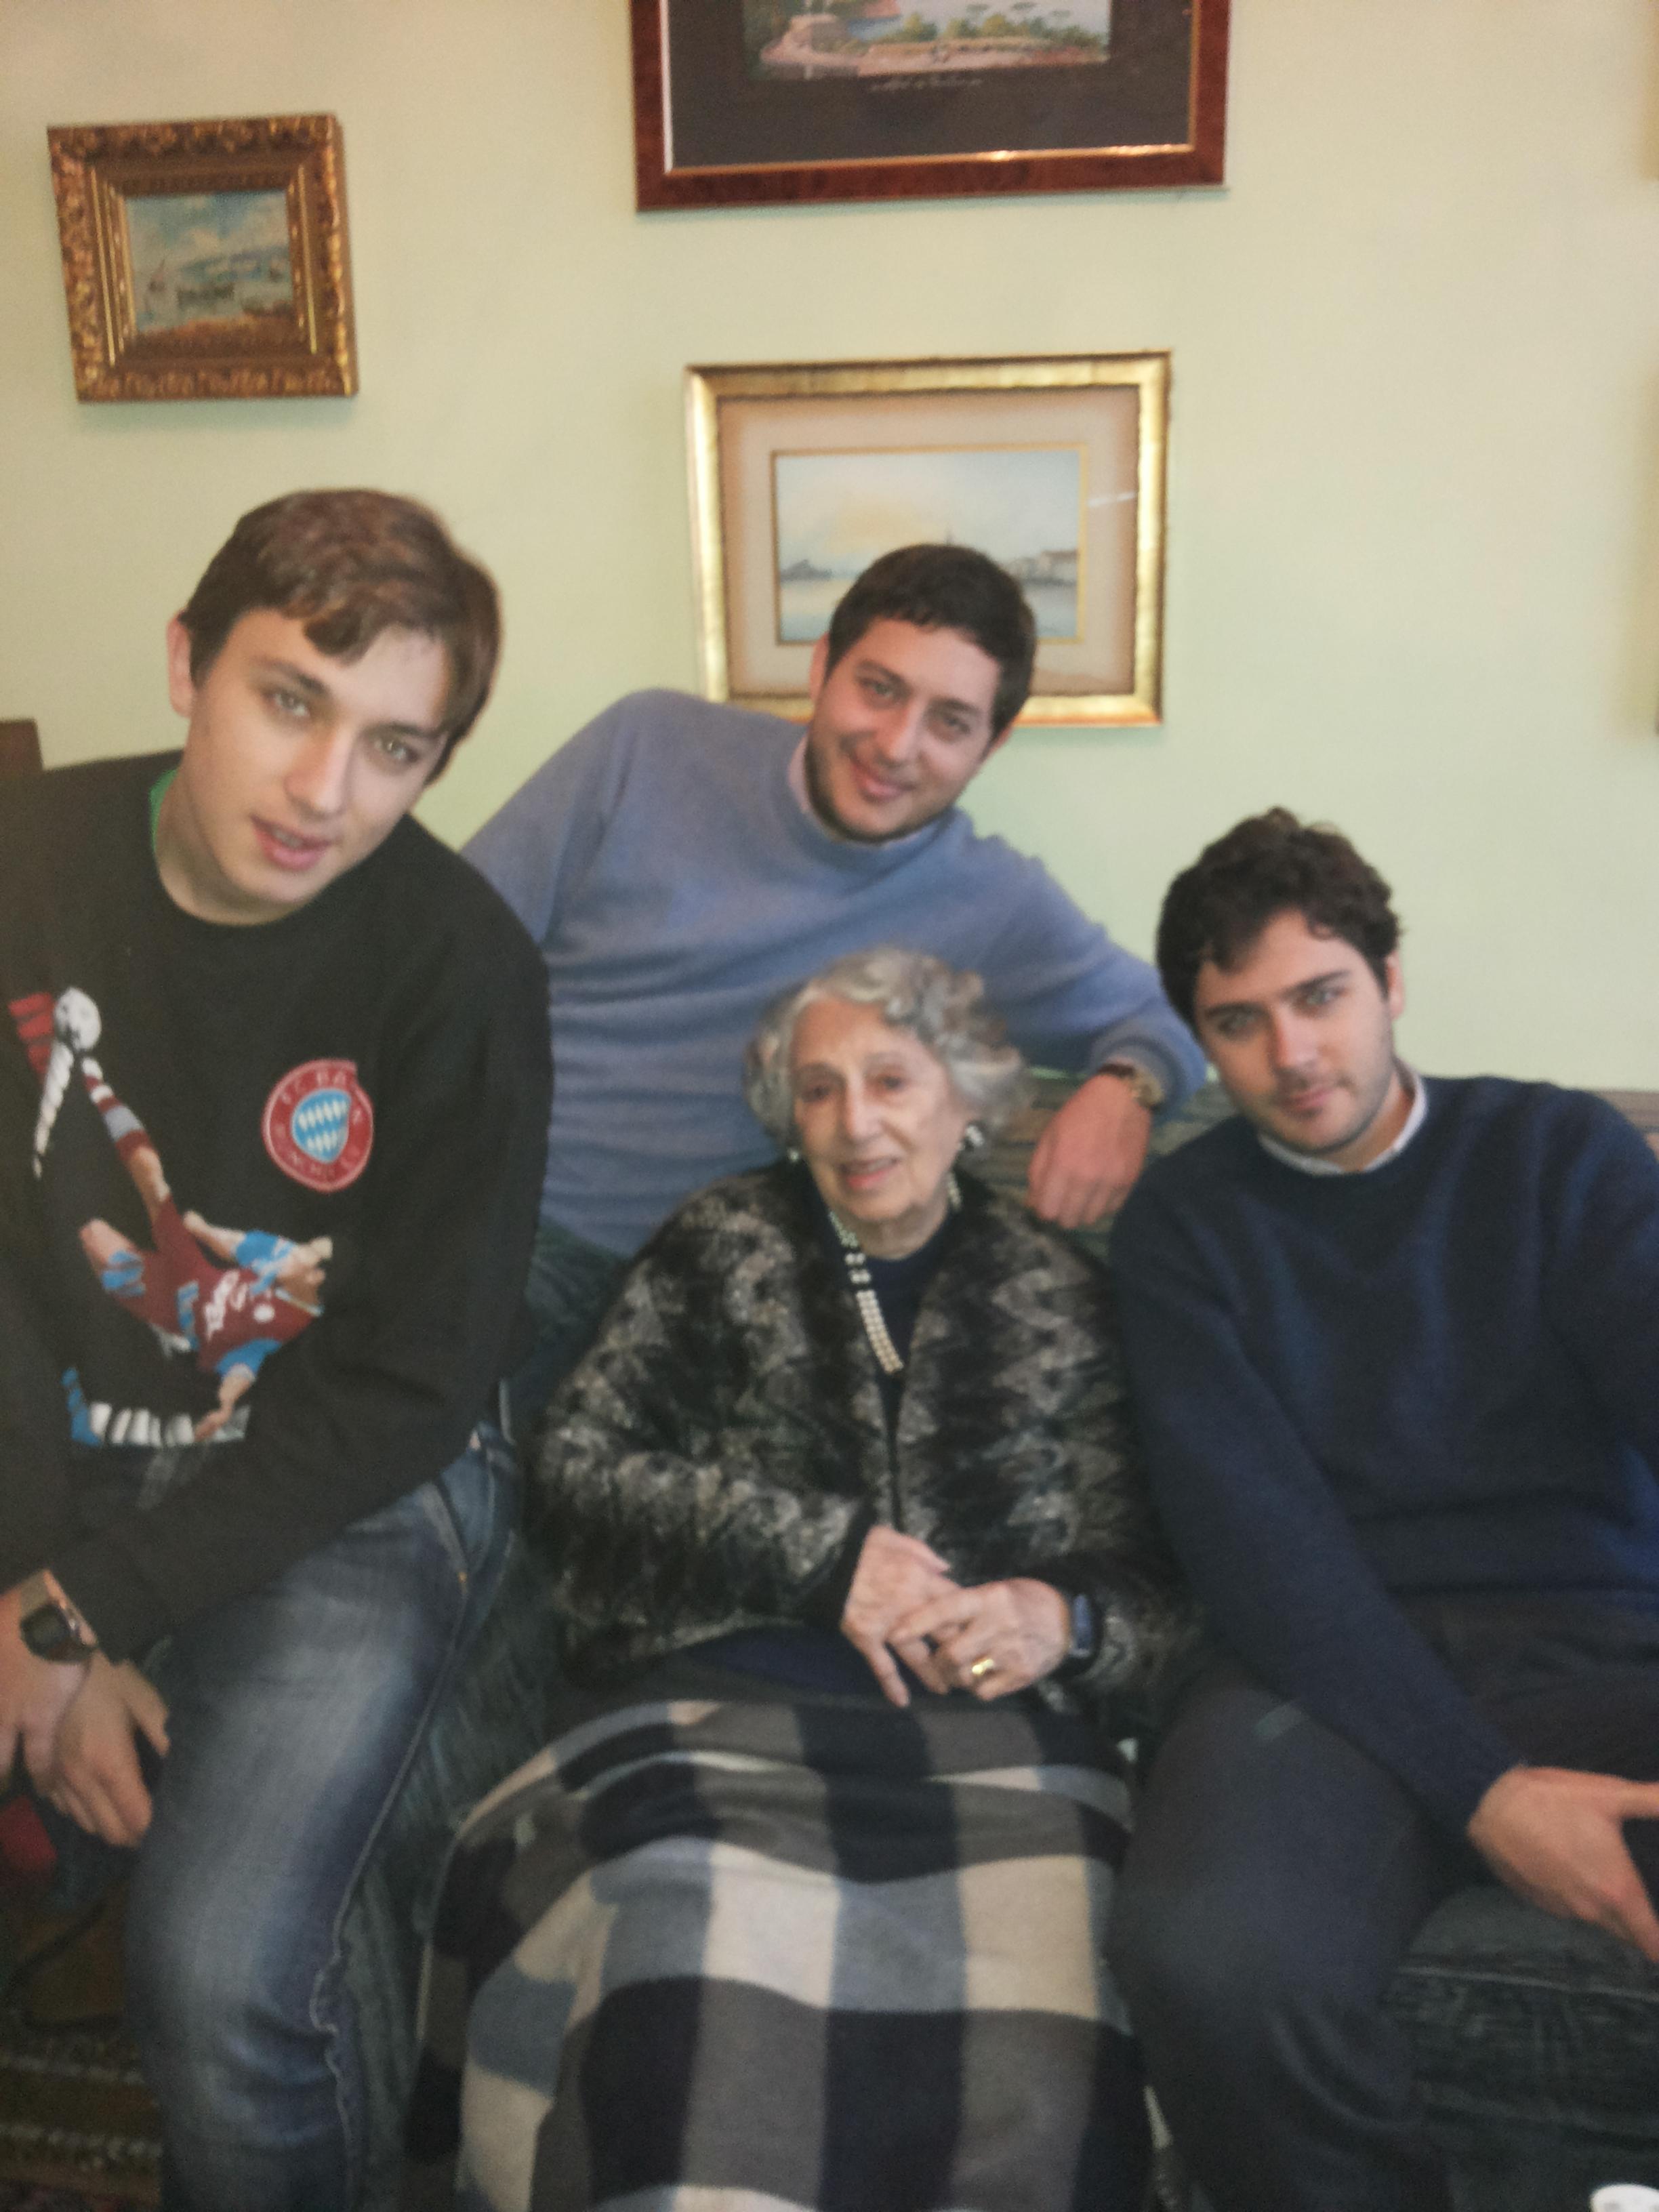 My nonna celebrating her 91st birthday with her three grandsons.